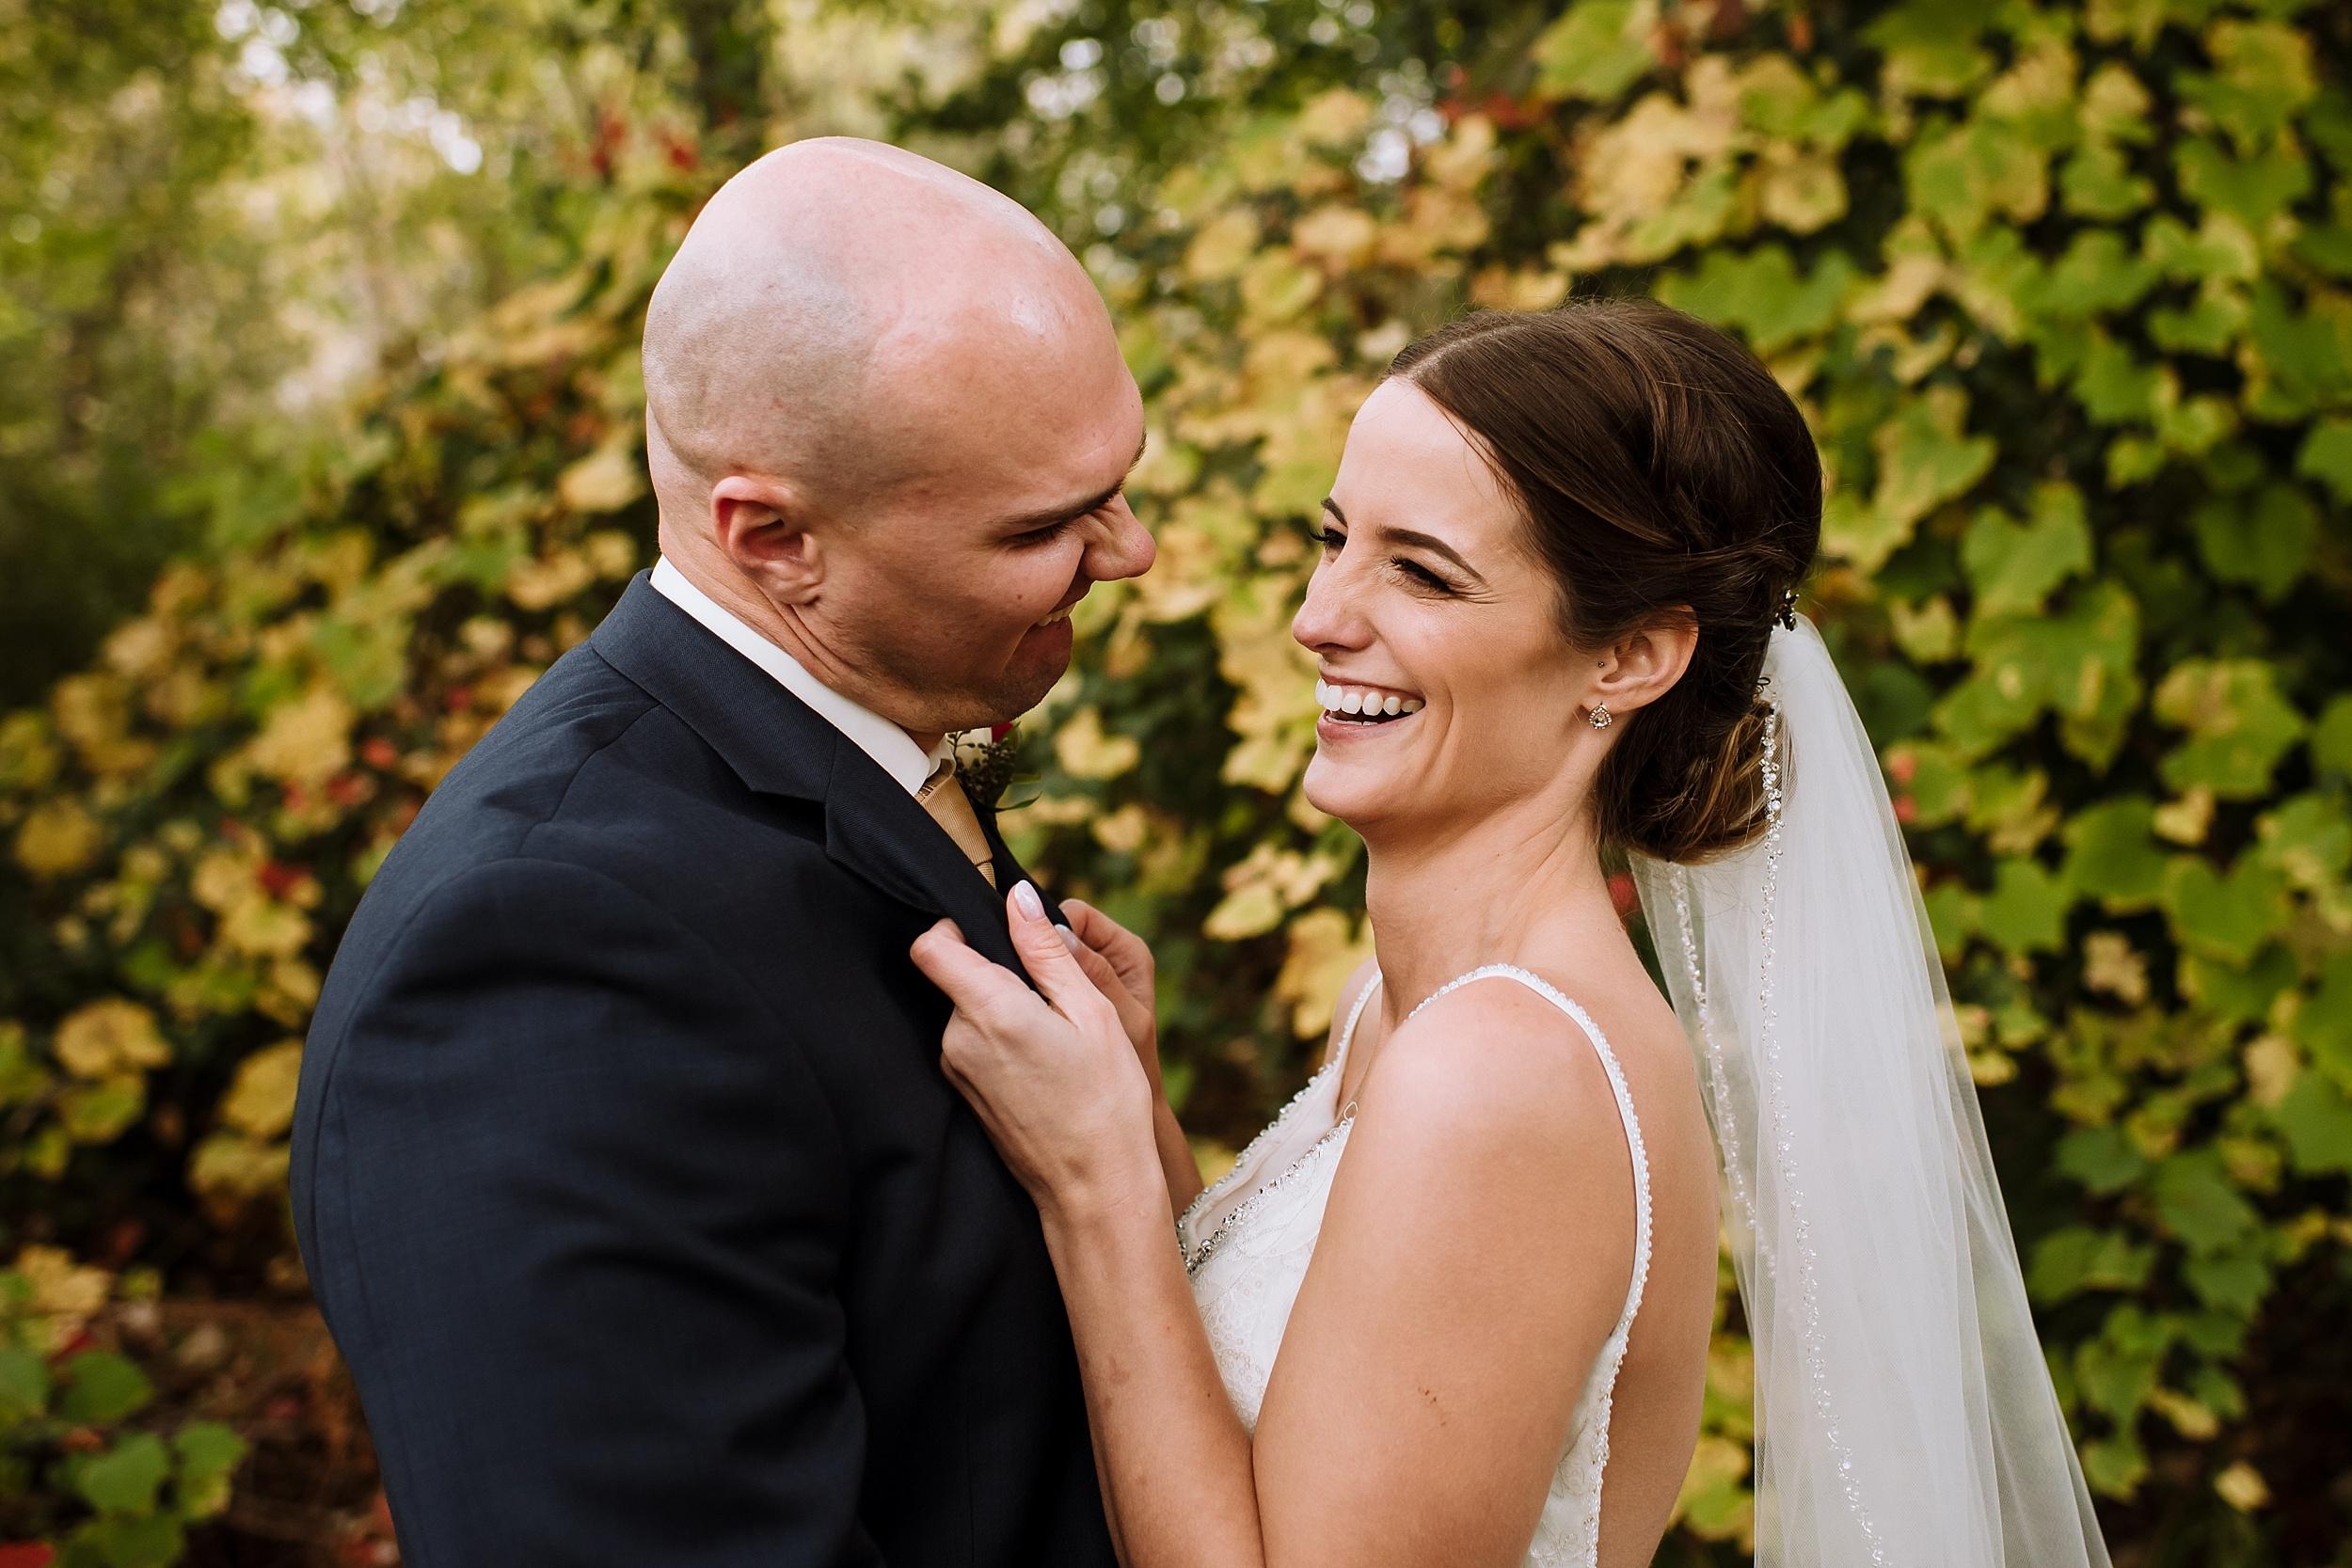 Windemere_Manor_Fall_Wedding_London_Toronto_Wedding_Photographer_0019.jpg